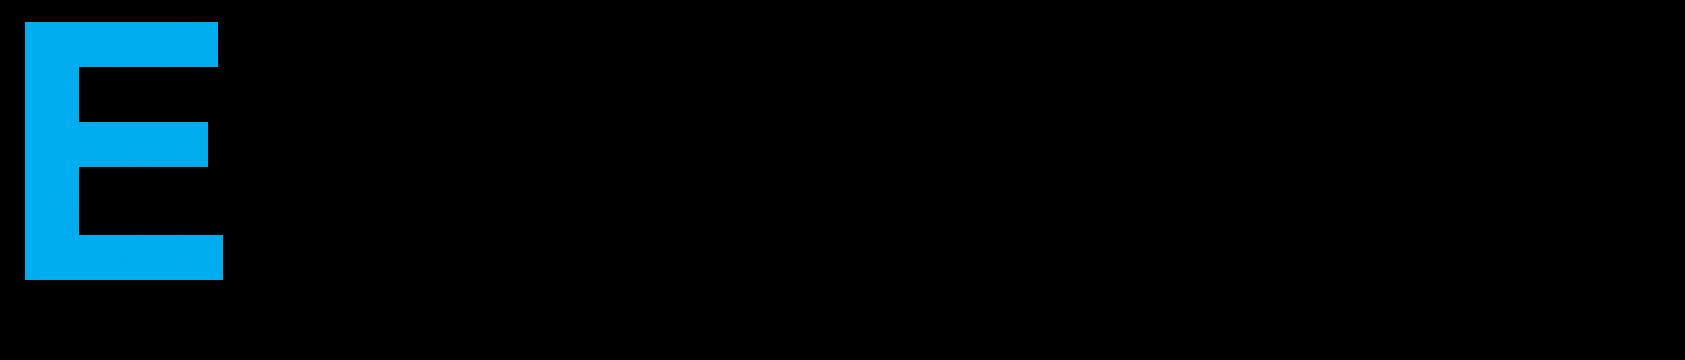 equestano logo